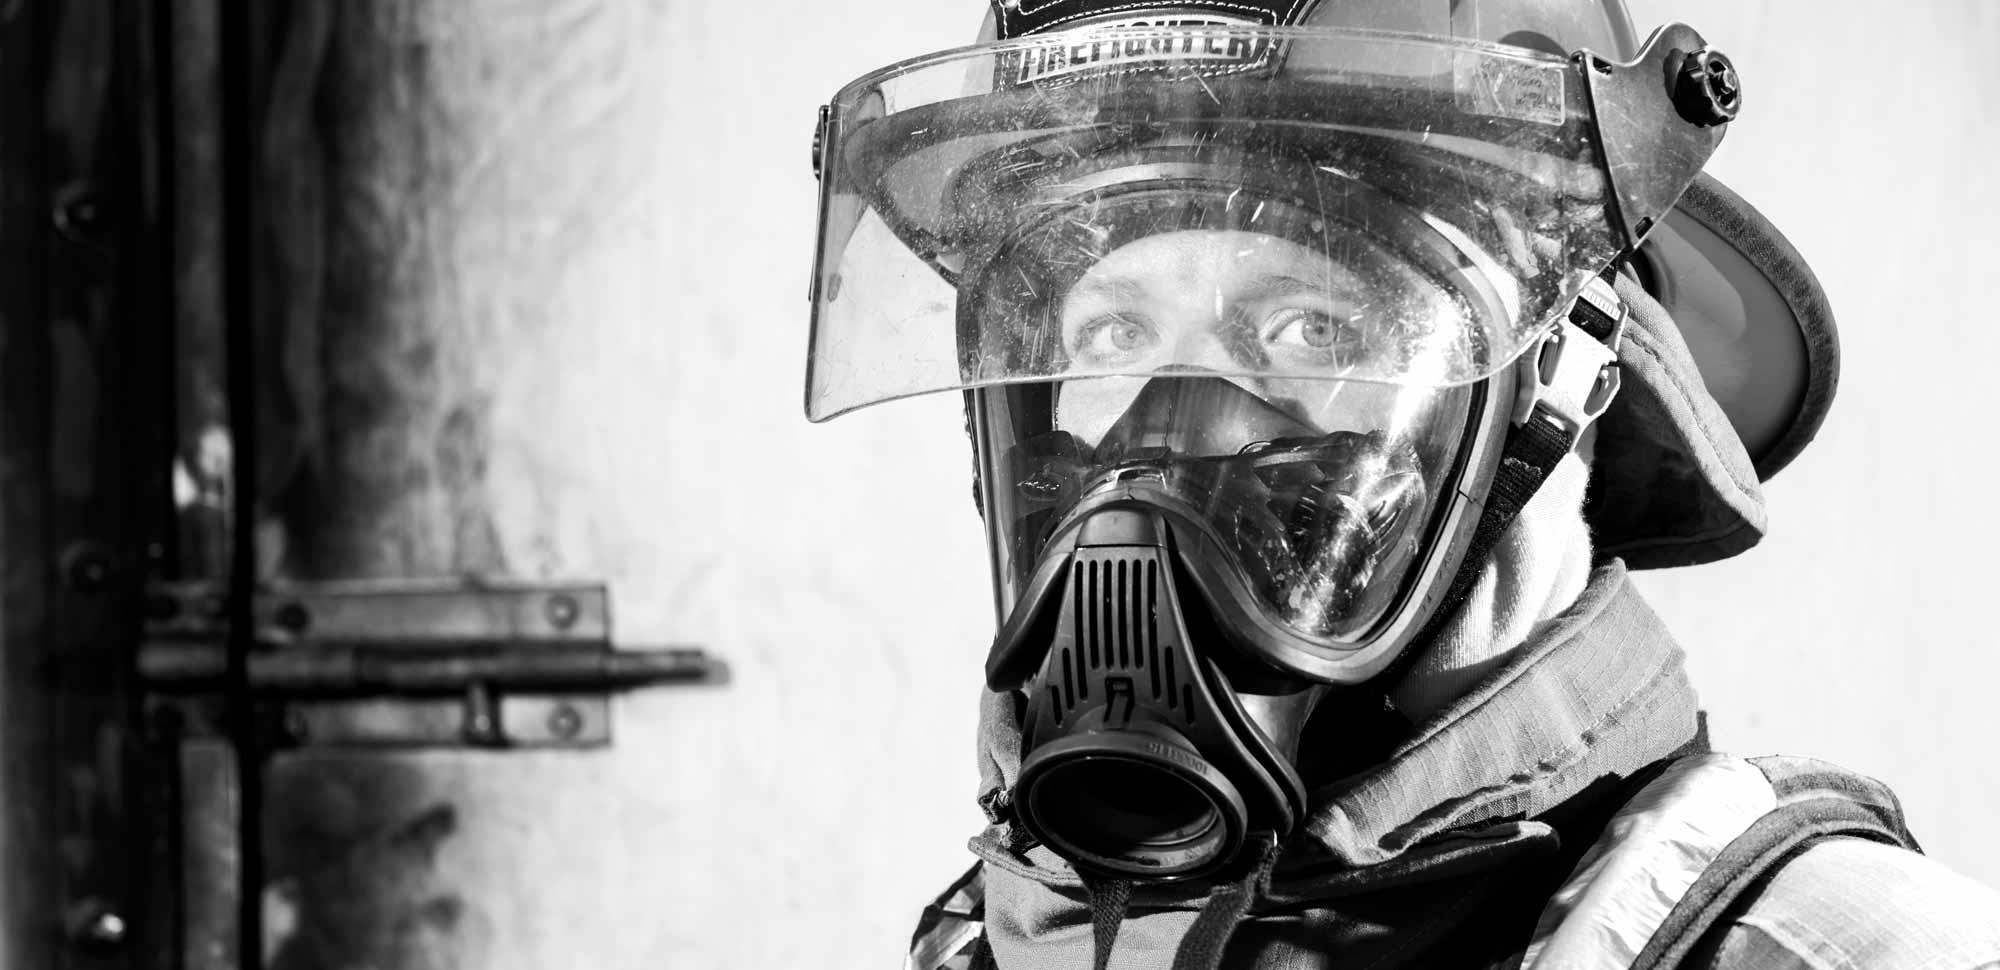 Women Firefighter Training Software Brand Photography